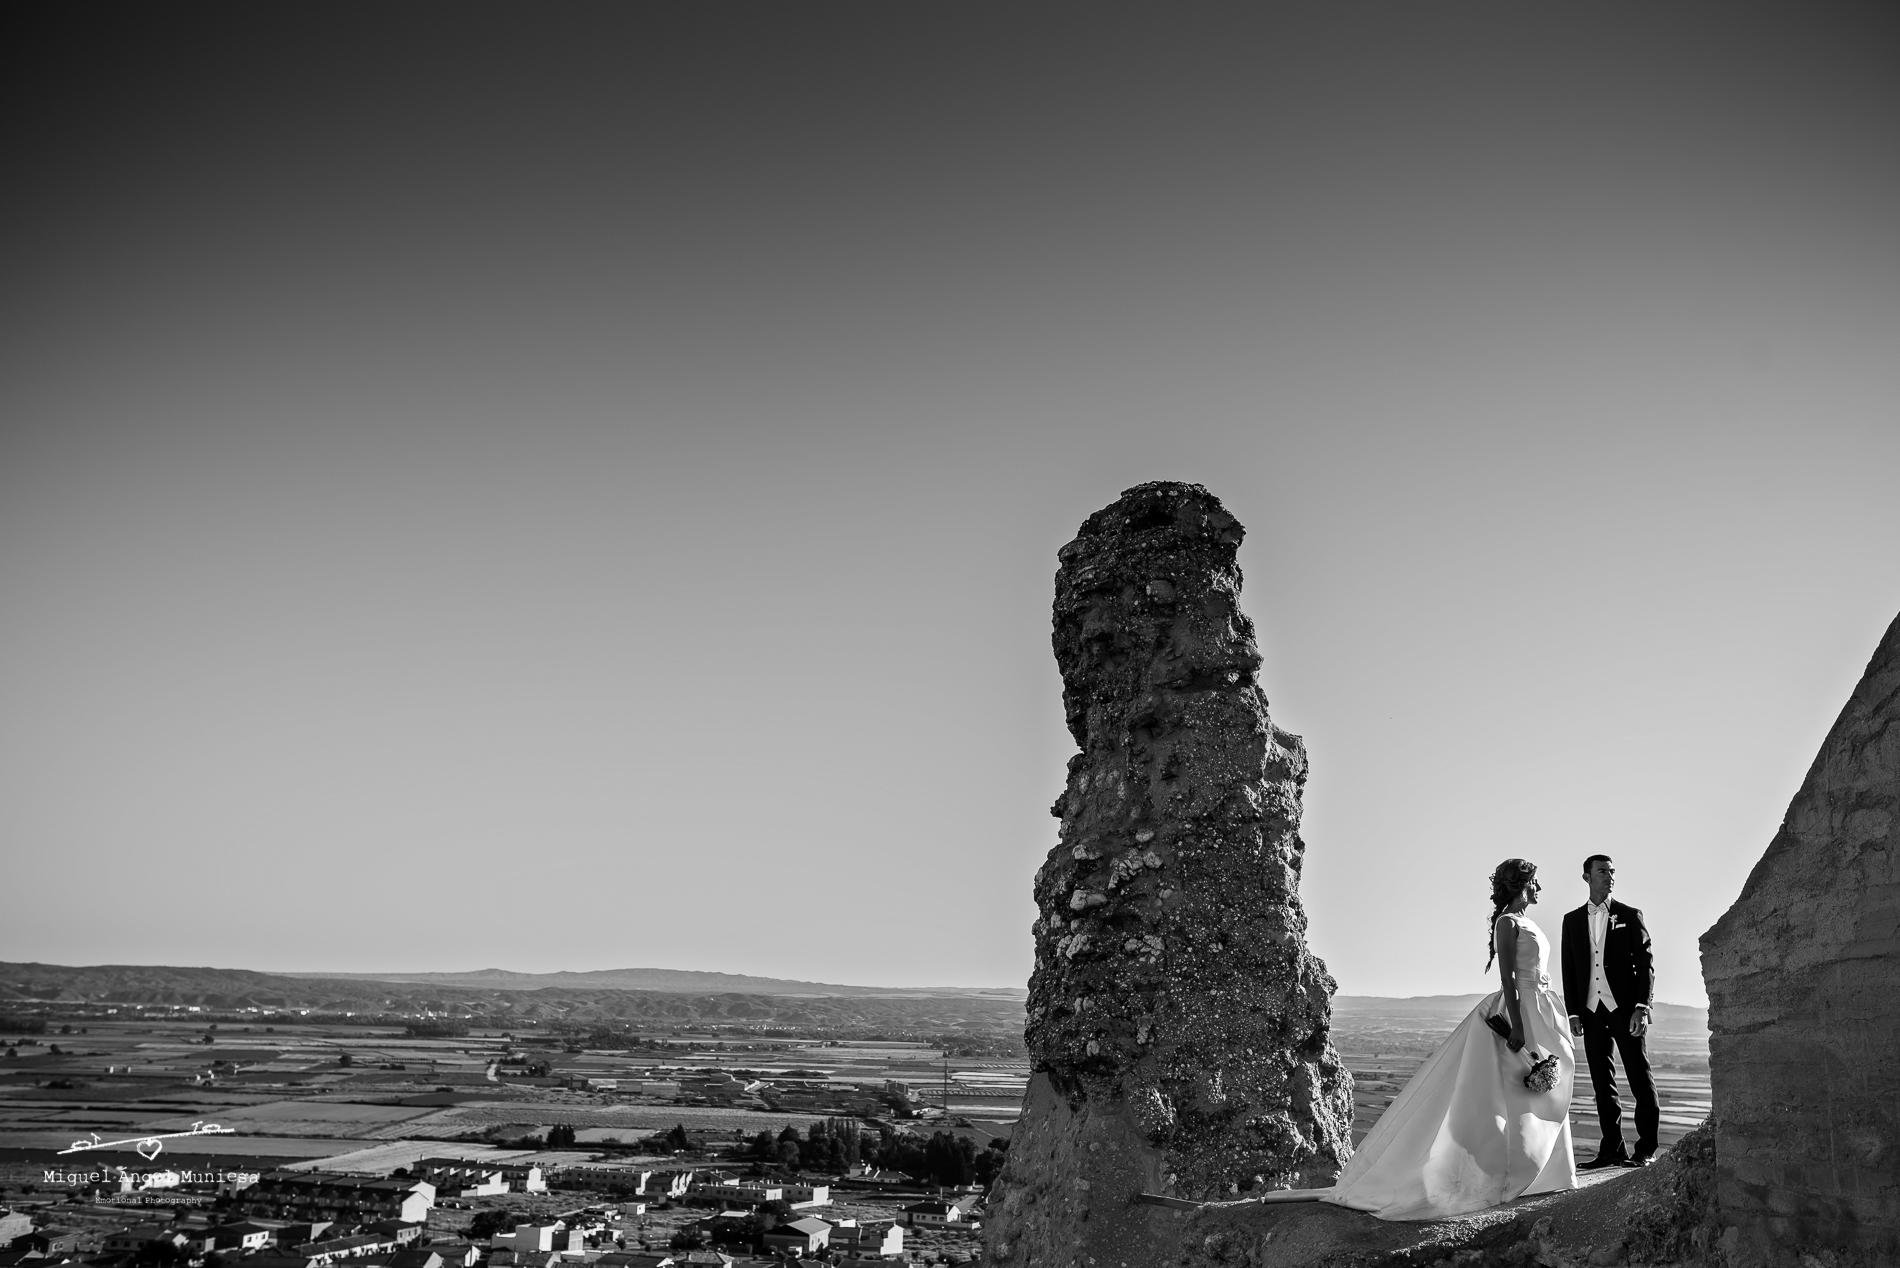 boda, fotografia de boda, boda zaragoza, fotografia, wedding, wedding photography, miguel angel muniesa, fotografo boda Zaragoza, fotografo boda, destination wedding_ 034